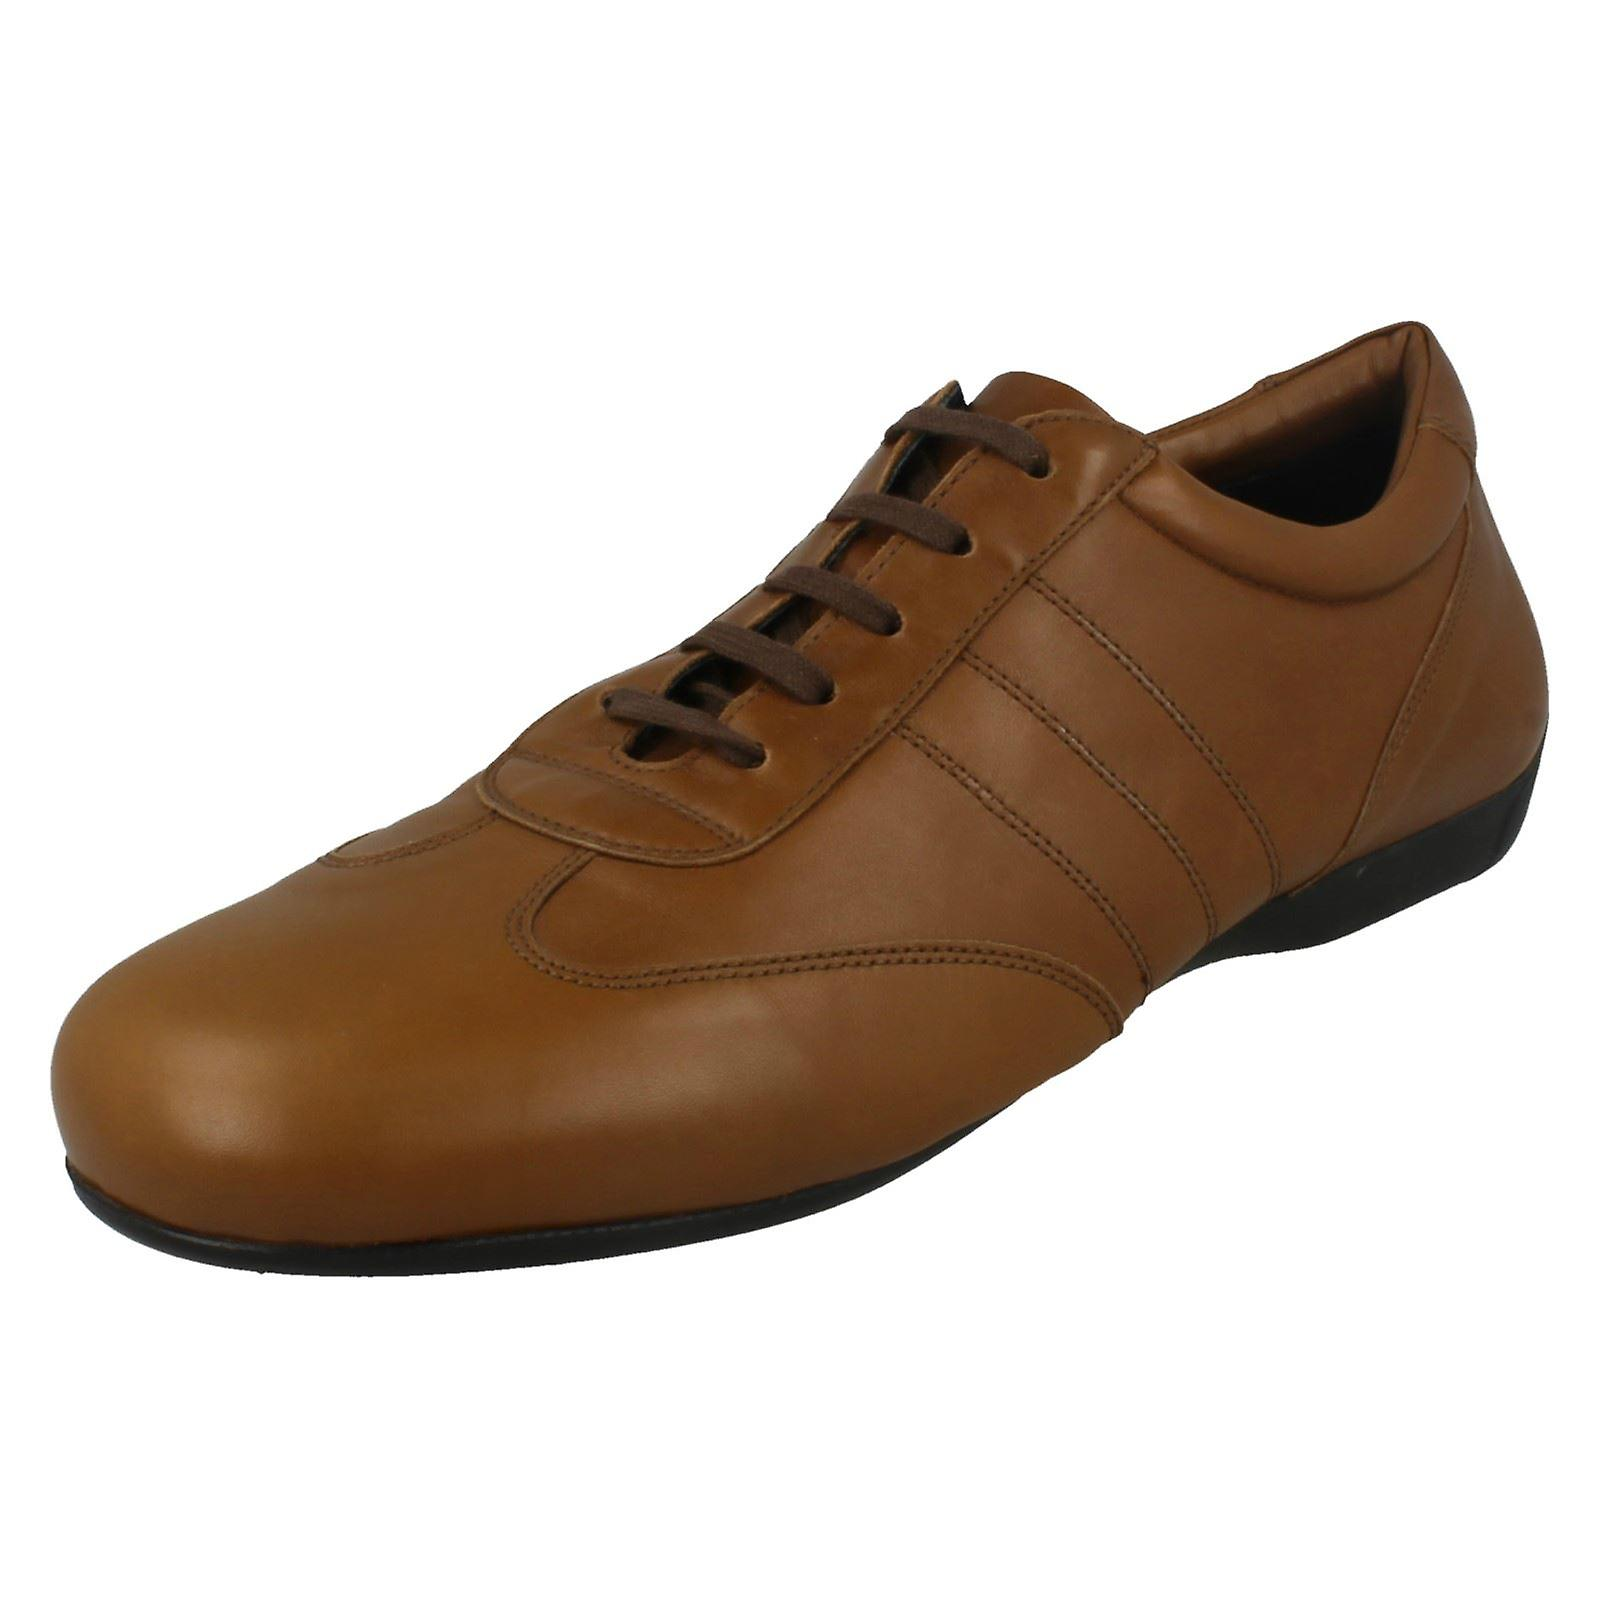 Mens Joseph Cheaney Casual Schuhe Rossi